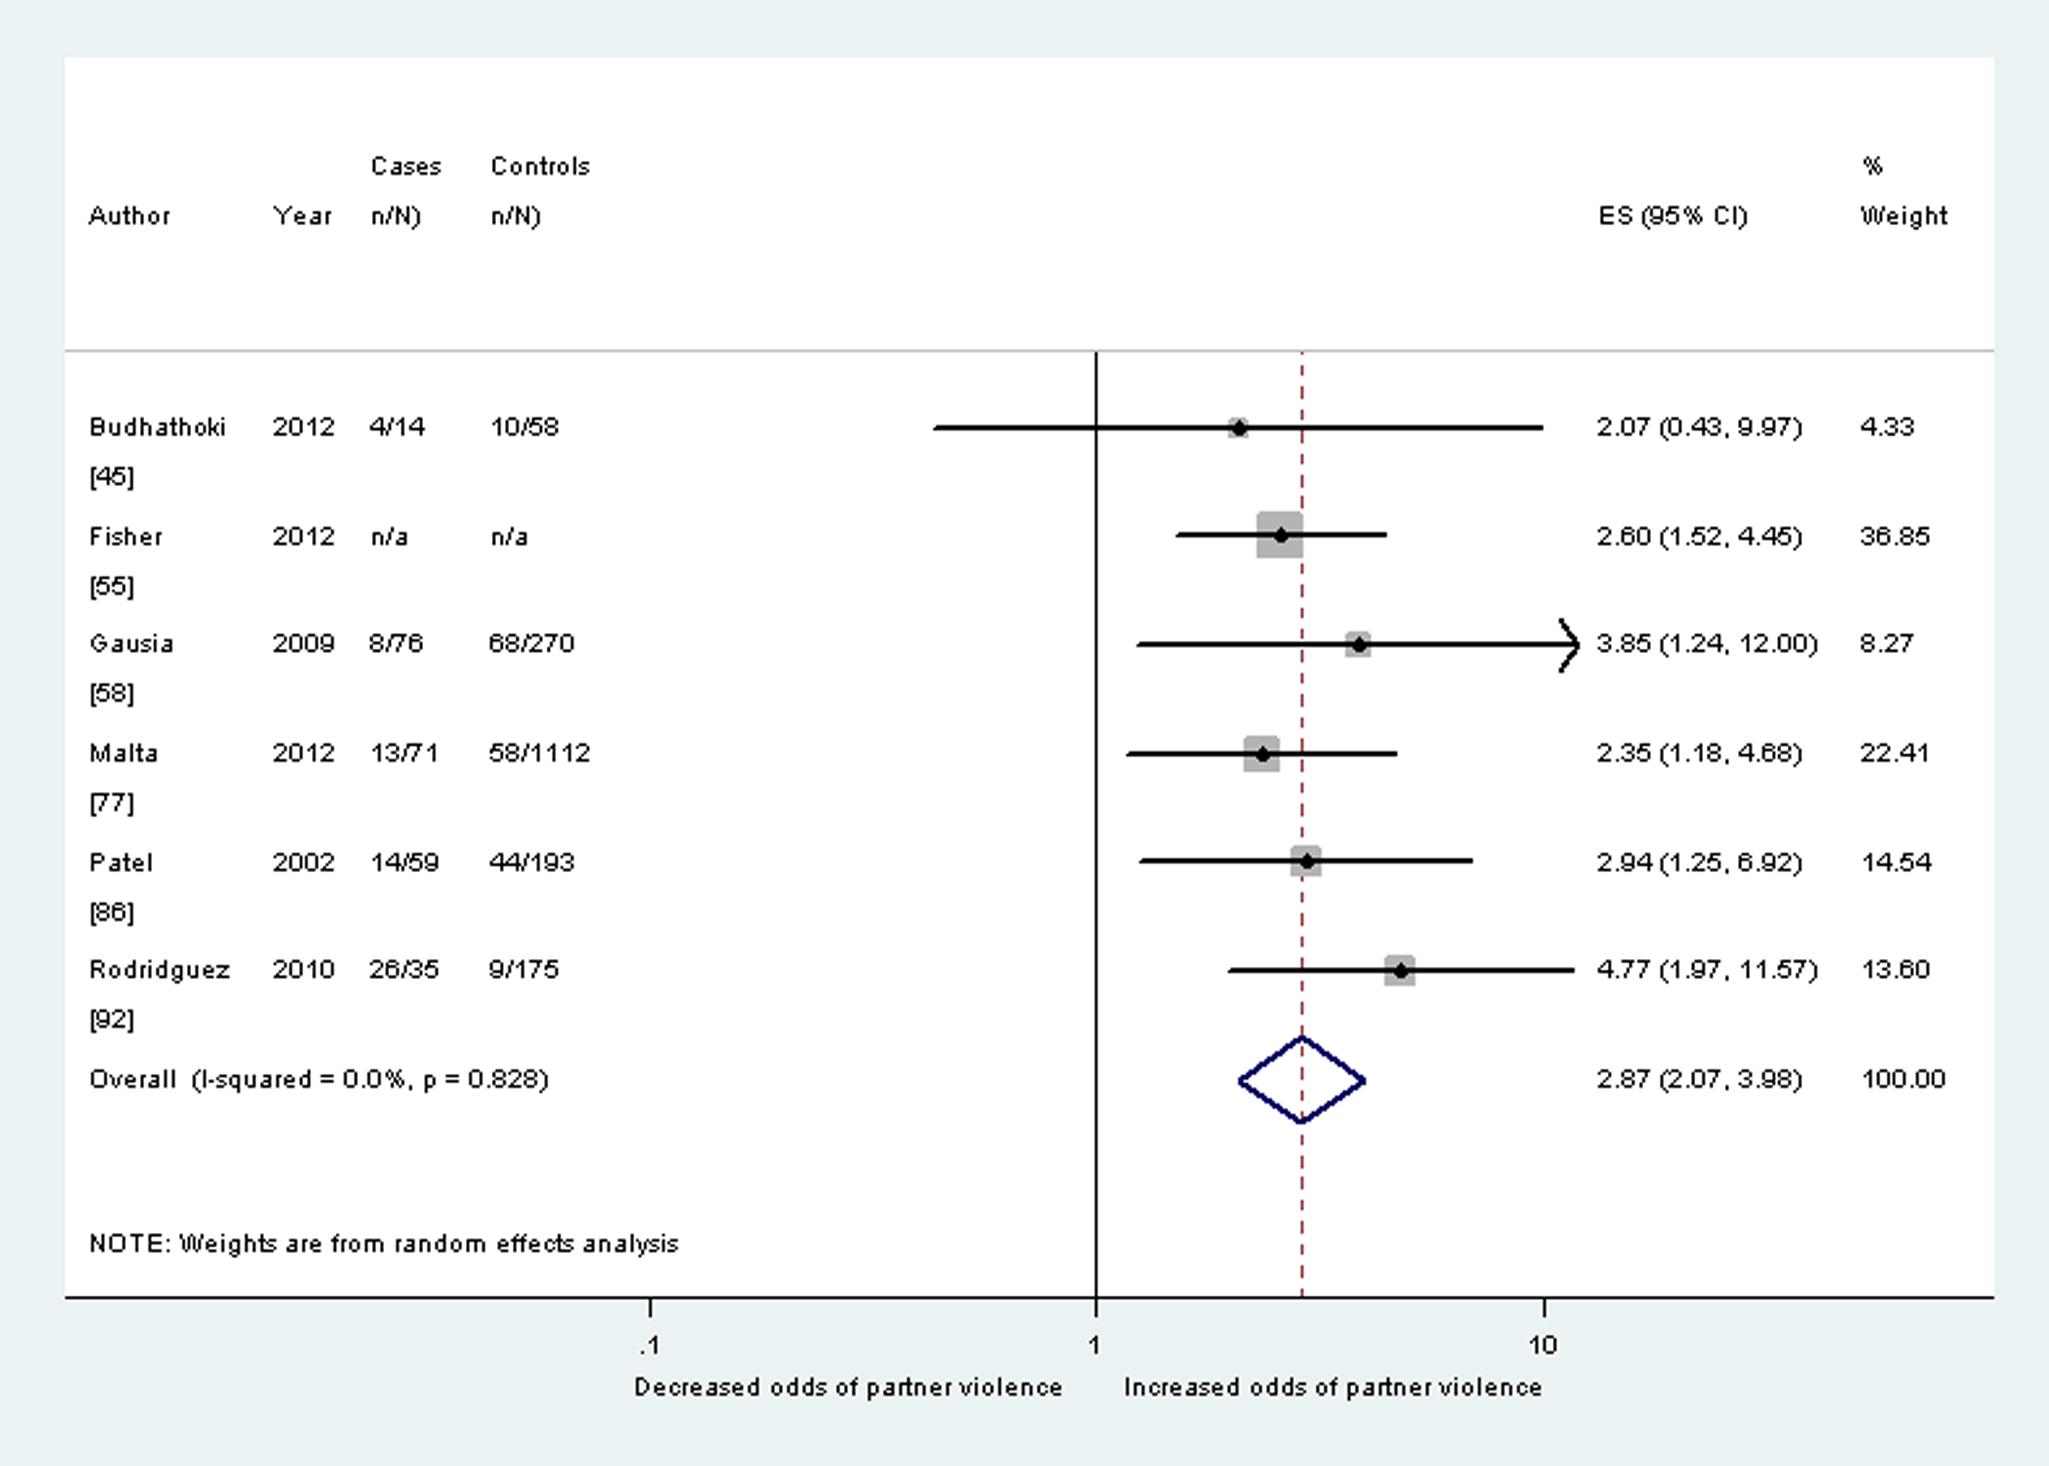 Meta-analysis of the association between any lifetime partner violence and postnatal depression (cohort studies).